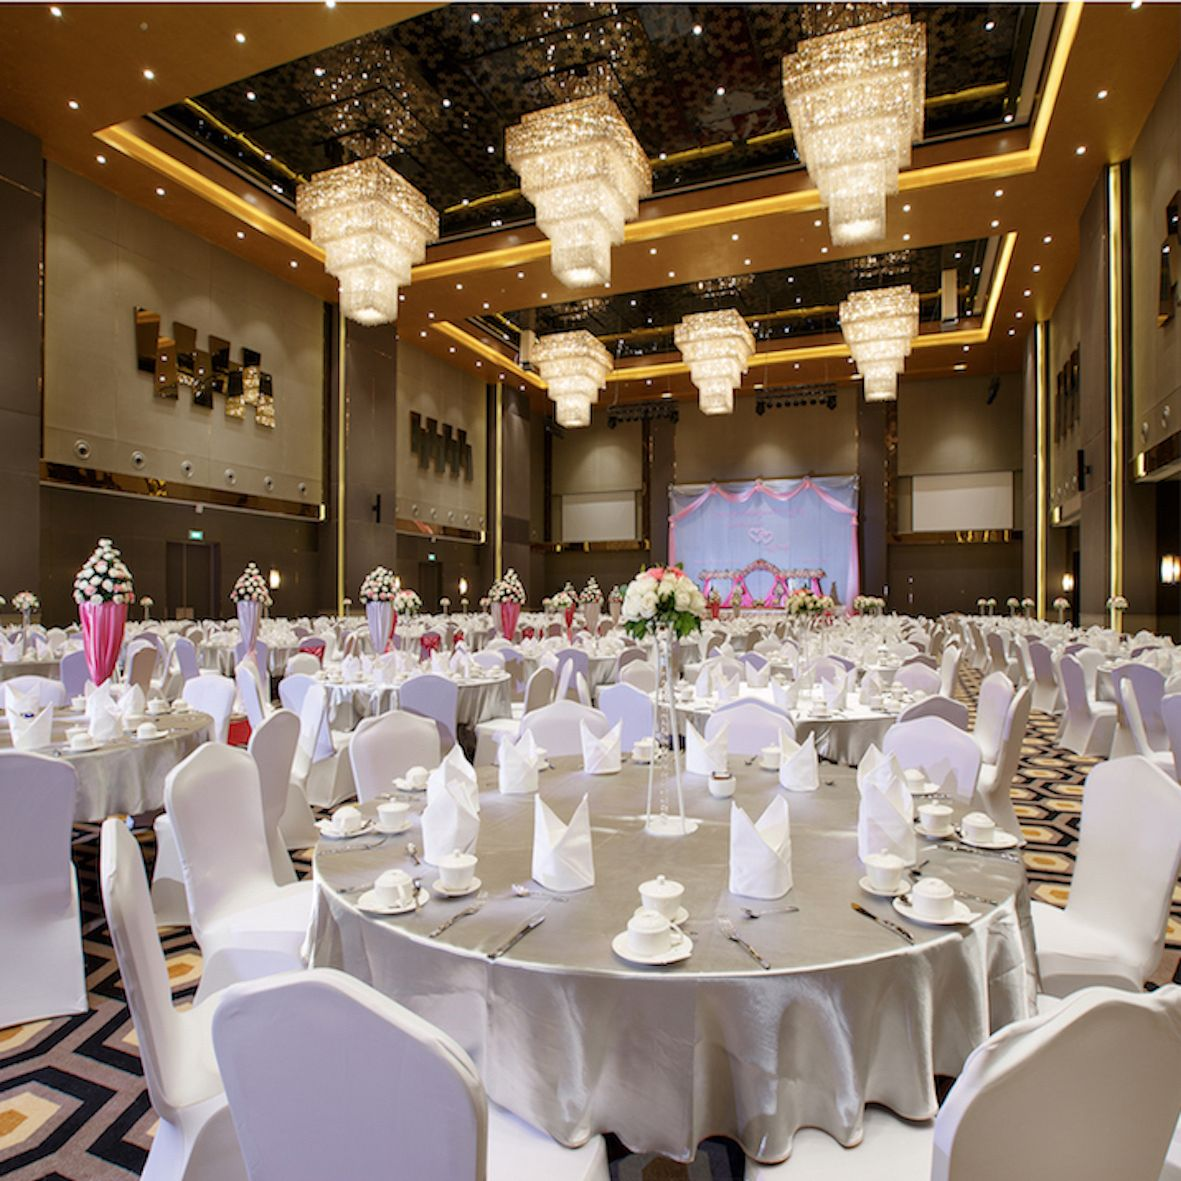 Banquet Hall Design: Www.iida-intl.com#Hospitality Designs#Modern Contemporary